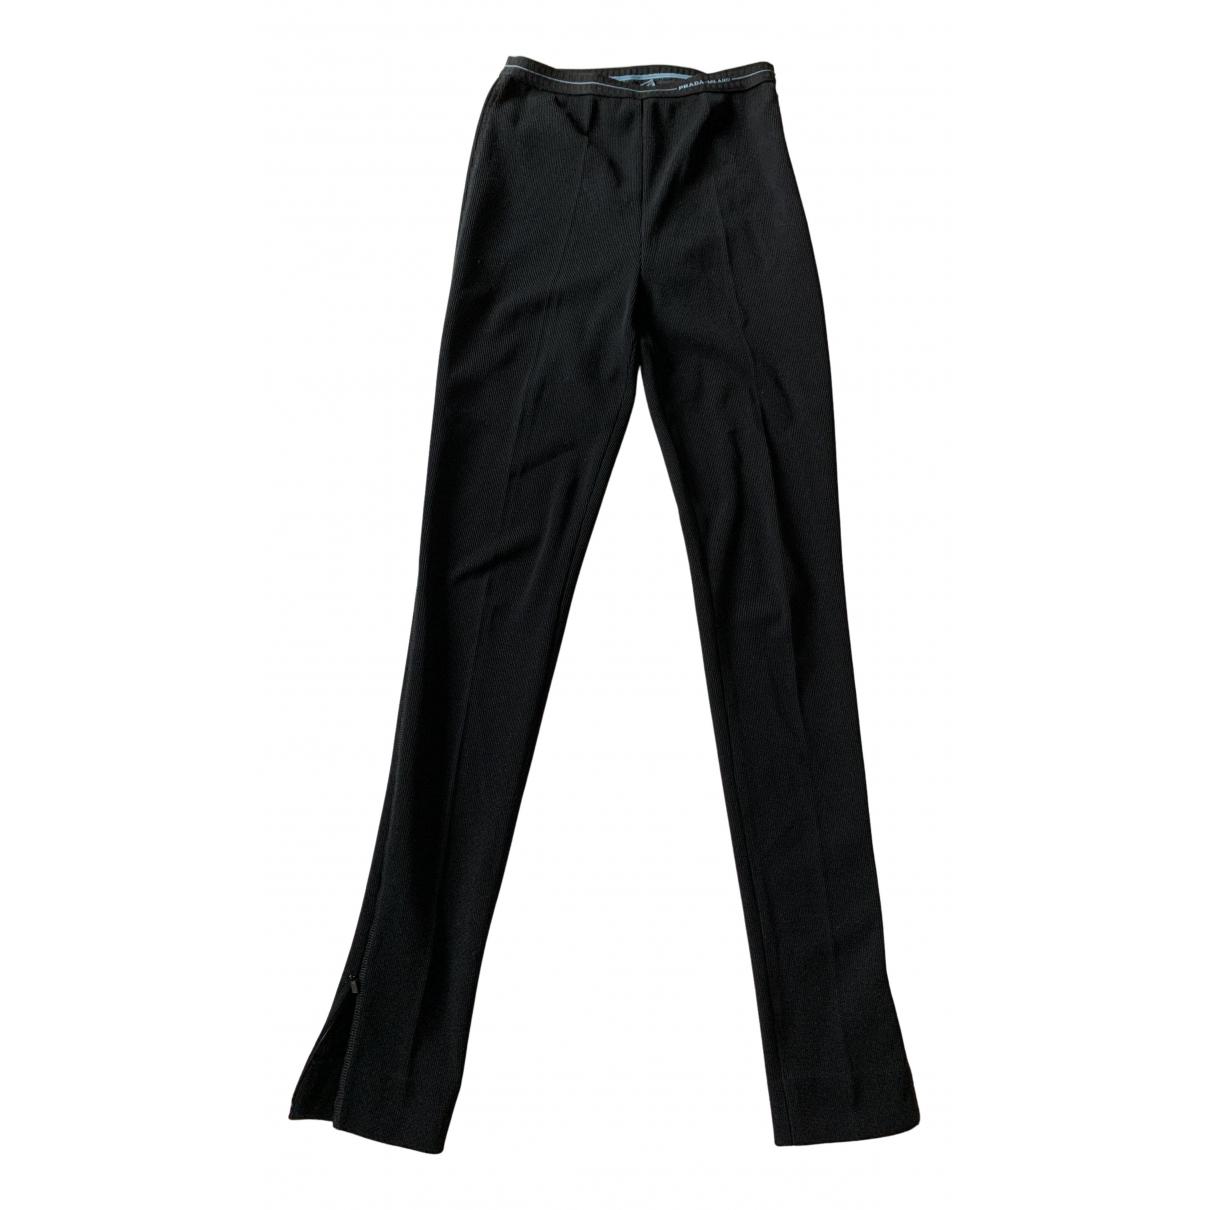 Prada N Black Trousers for Women 38 IT